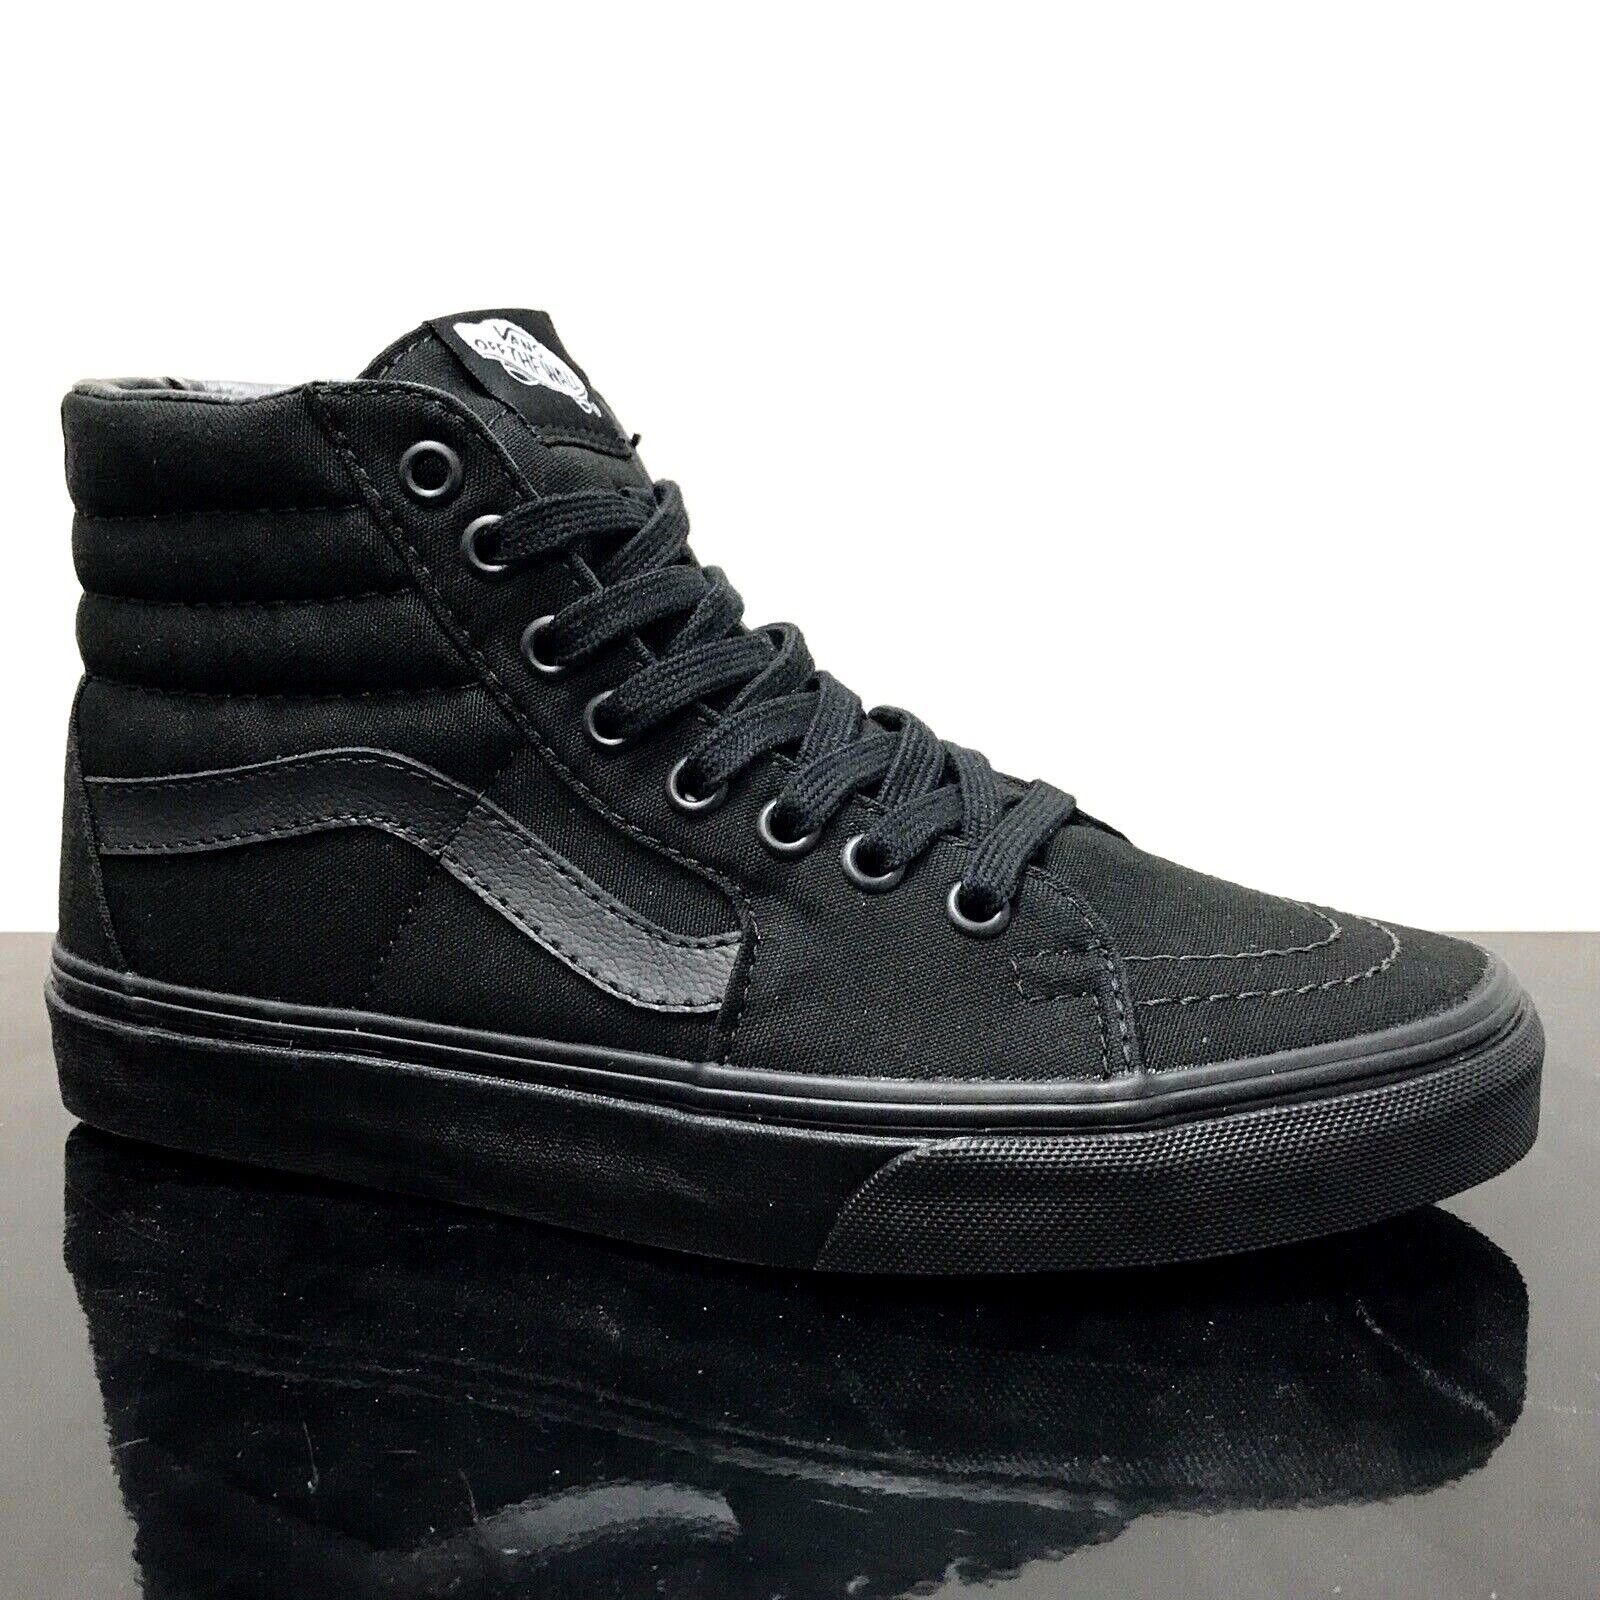 VANS SK8 HI BLACK BLACK BLACK CANVAS